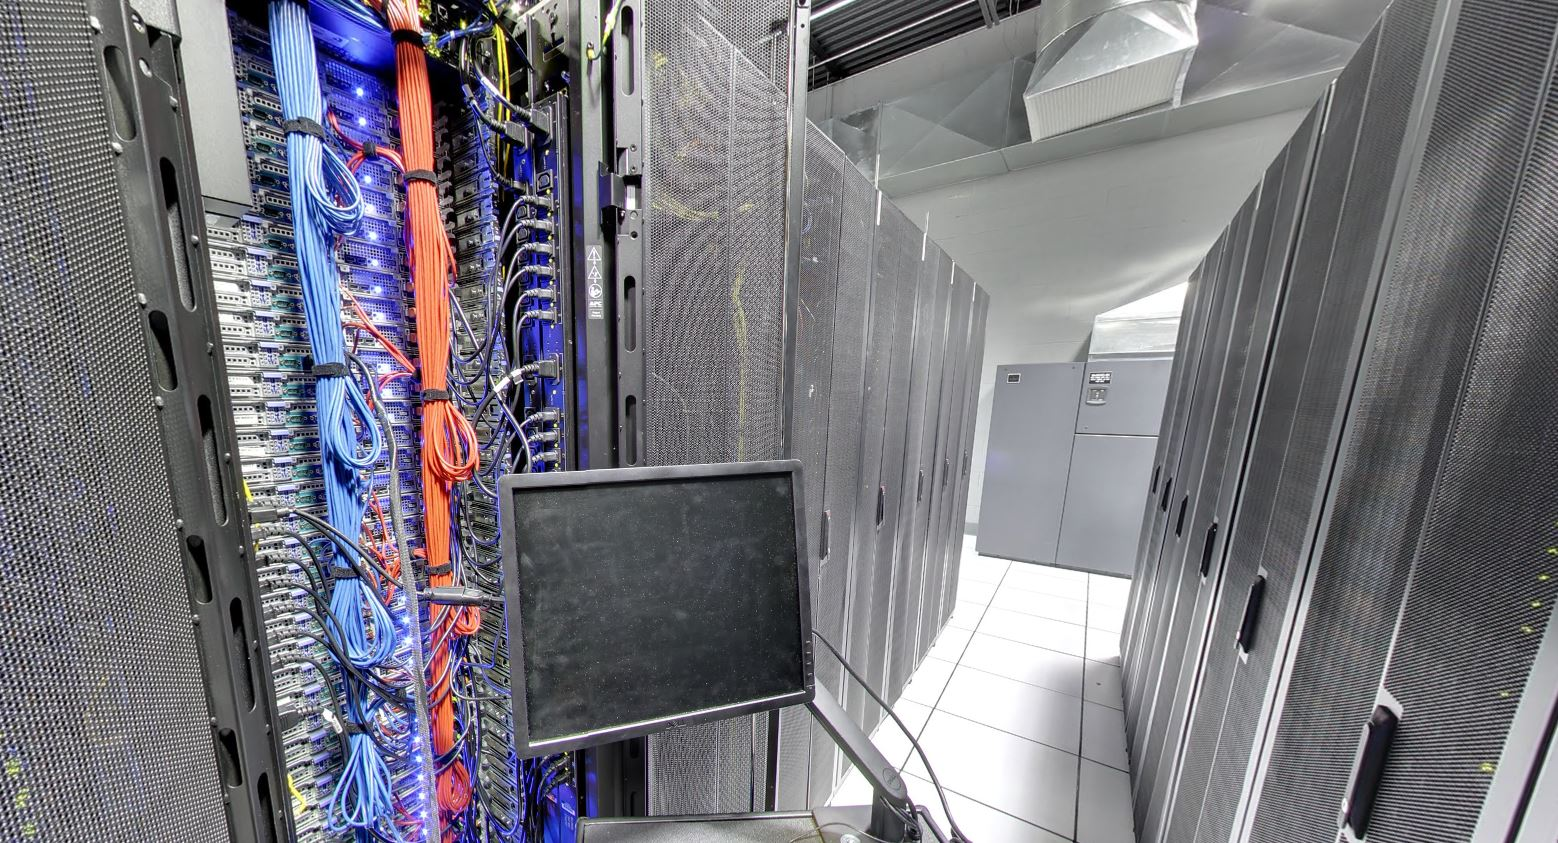 Nexcess, Melrose Avenue, Data Racks